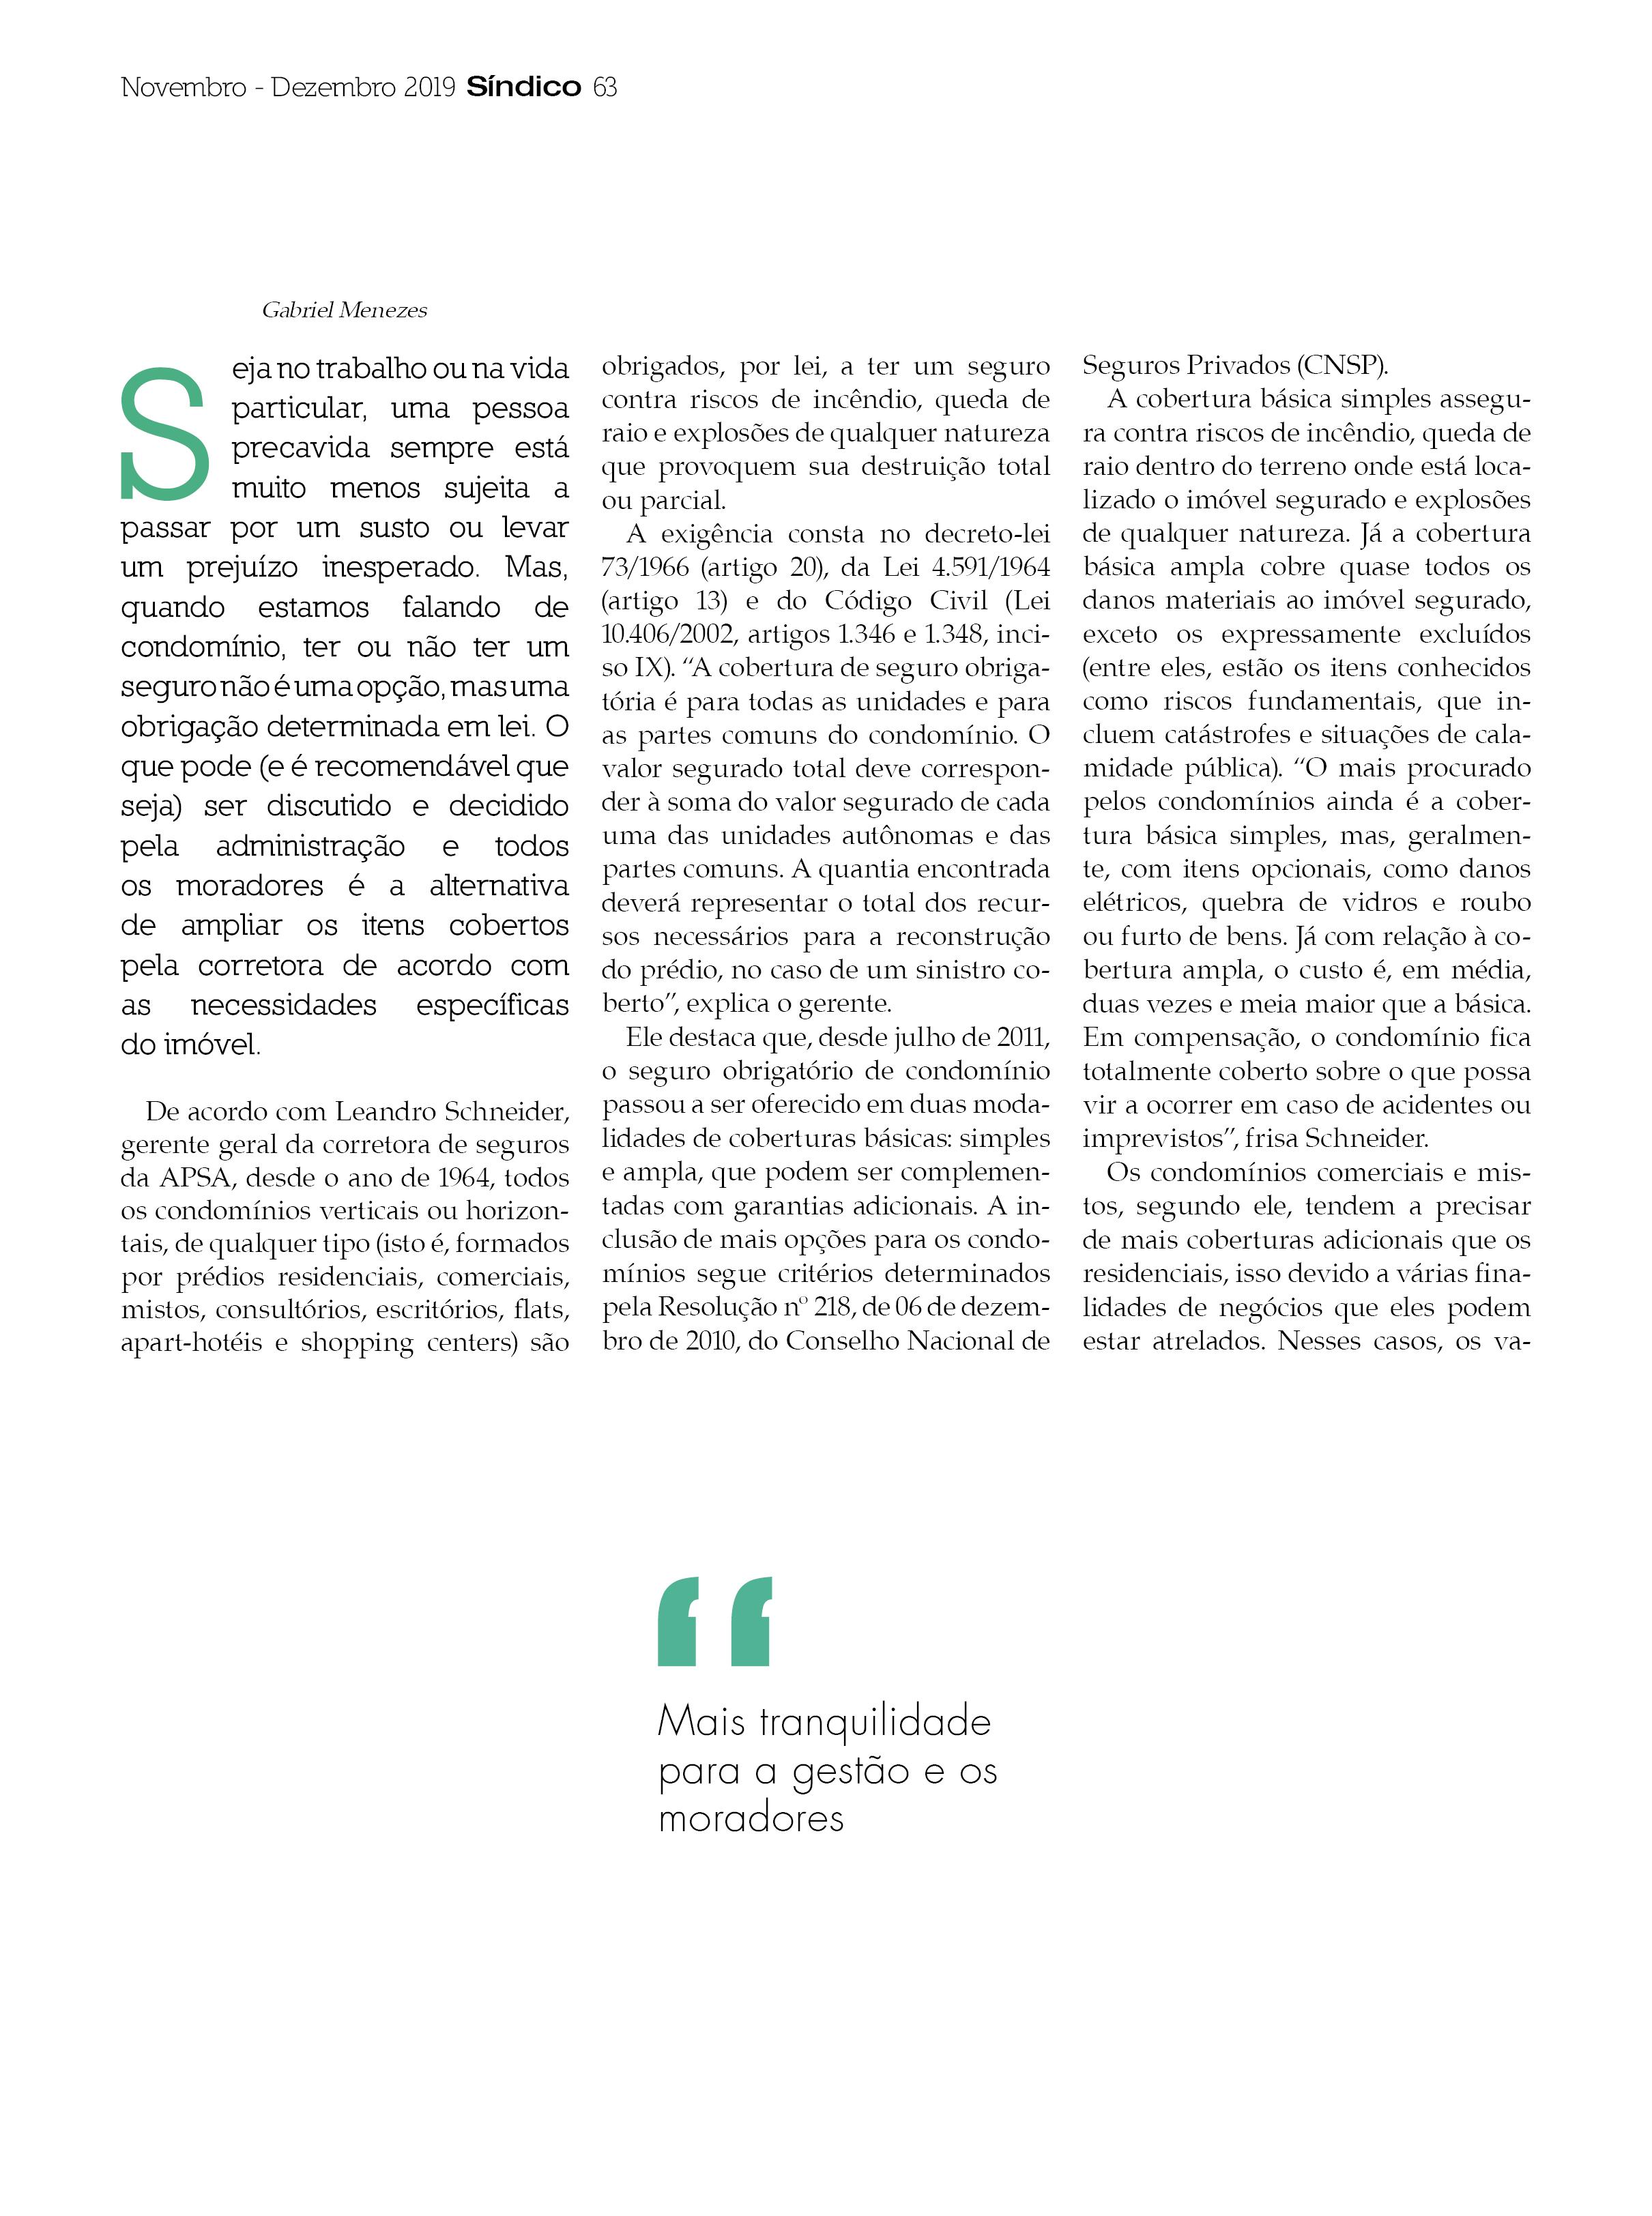 Revista Síndico_ed 247_61